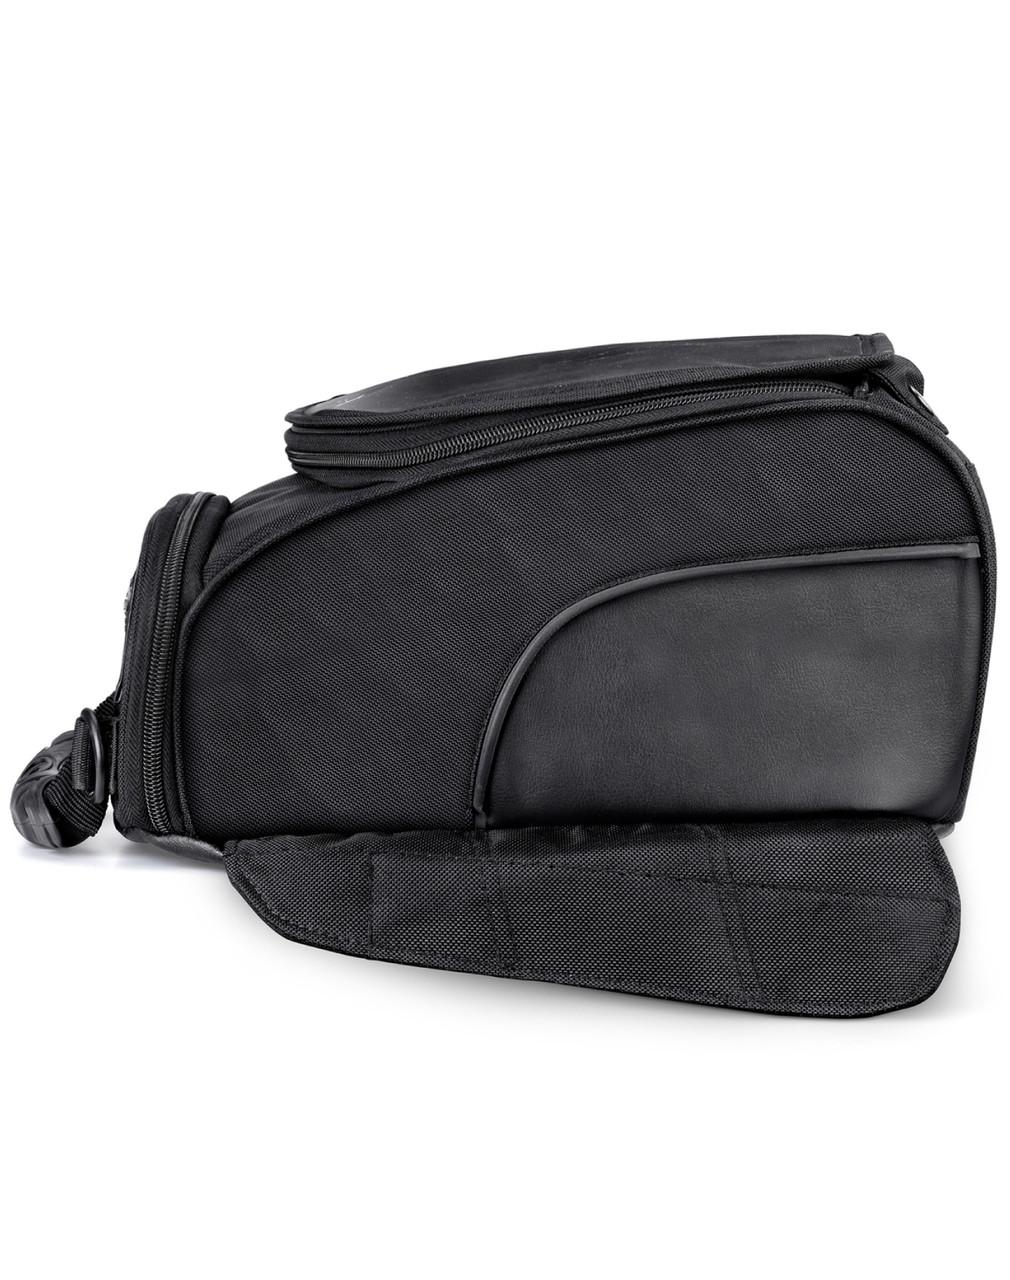 VikingBags AXE Medium Black Magnetic Motorcycle Tank Bag Side View